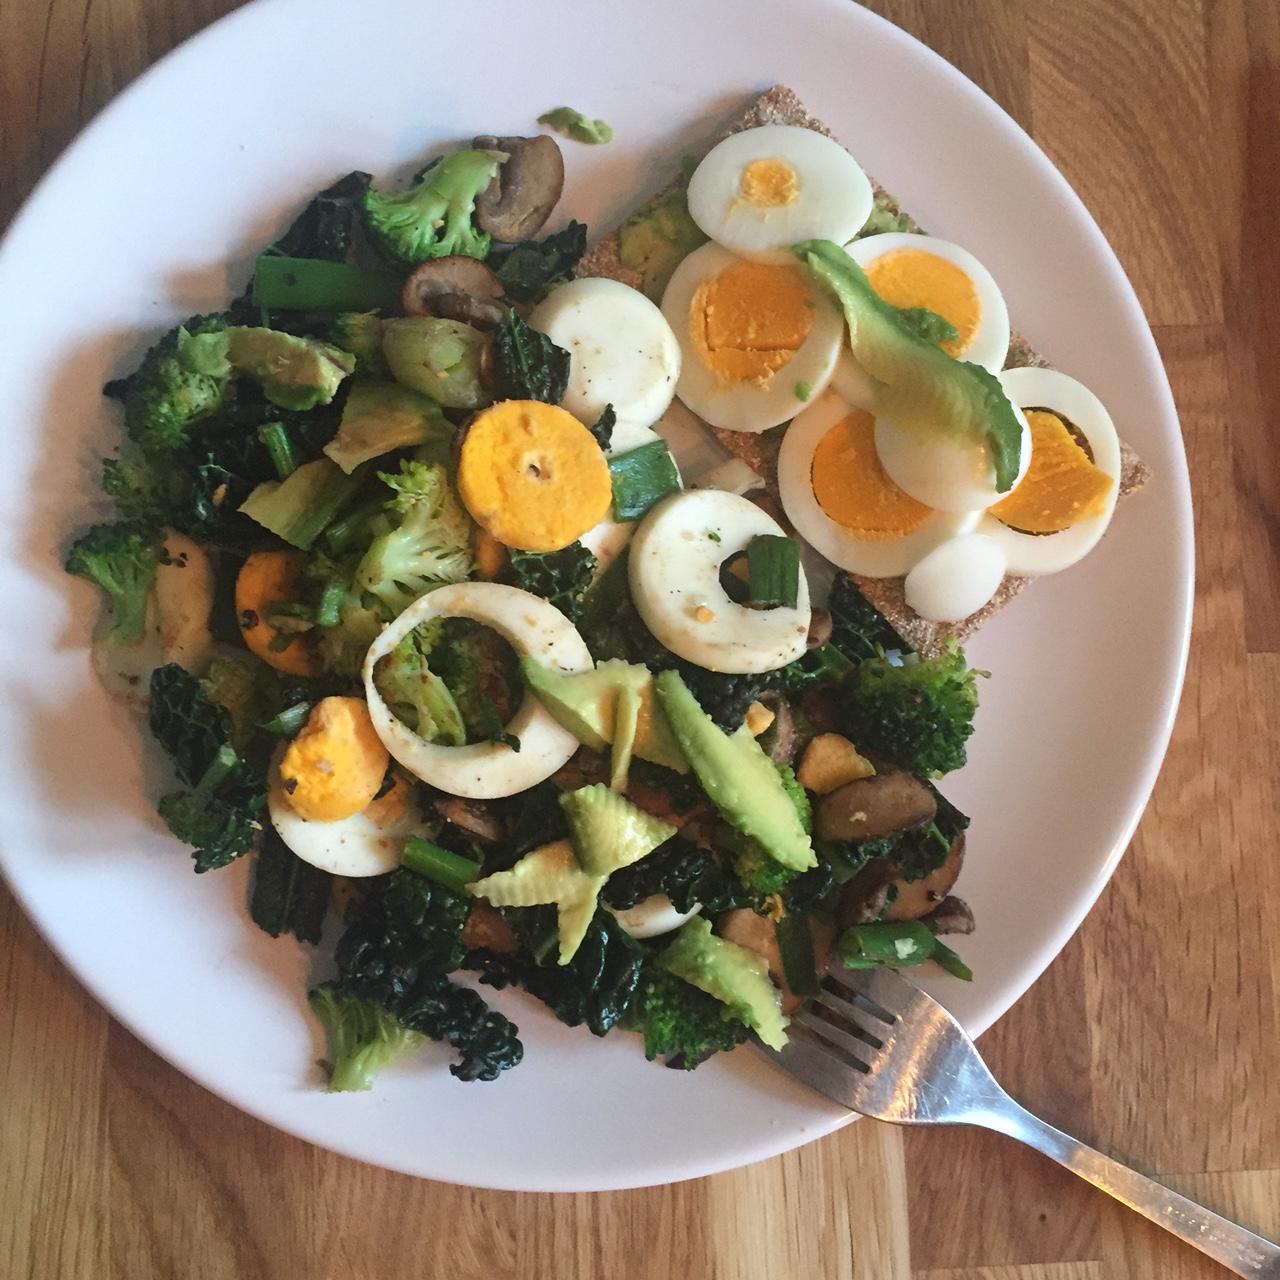 gewokte groenten en 2 gekookte eieren